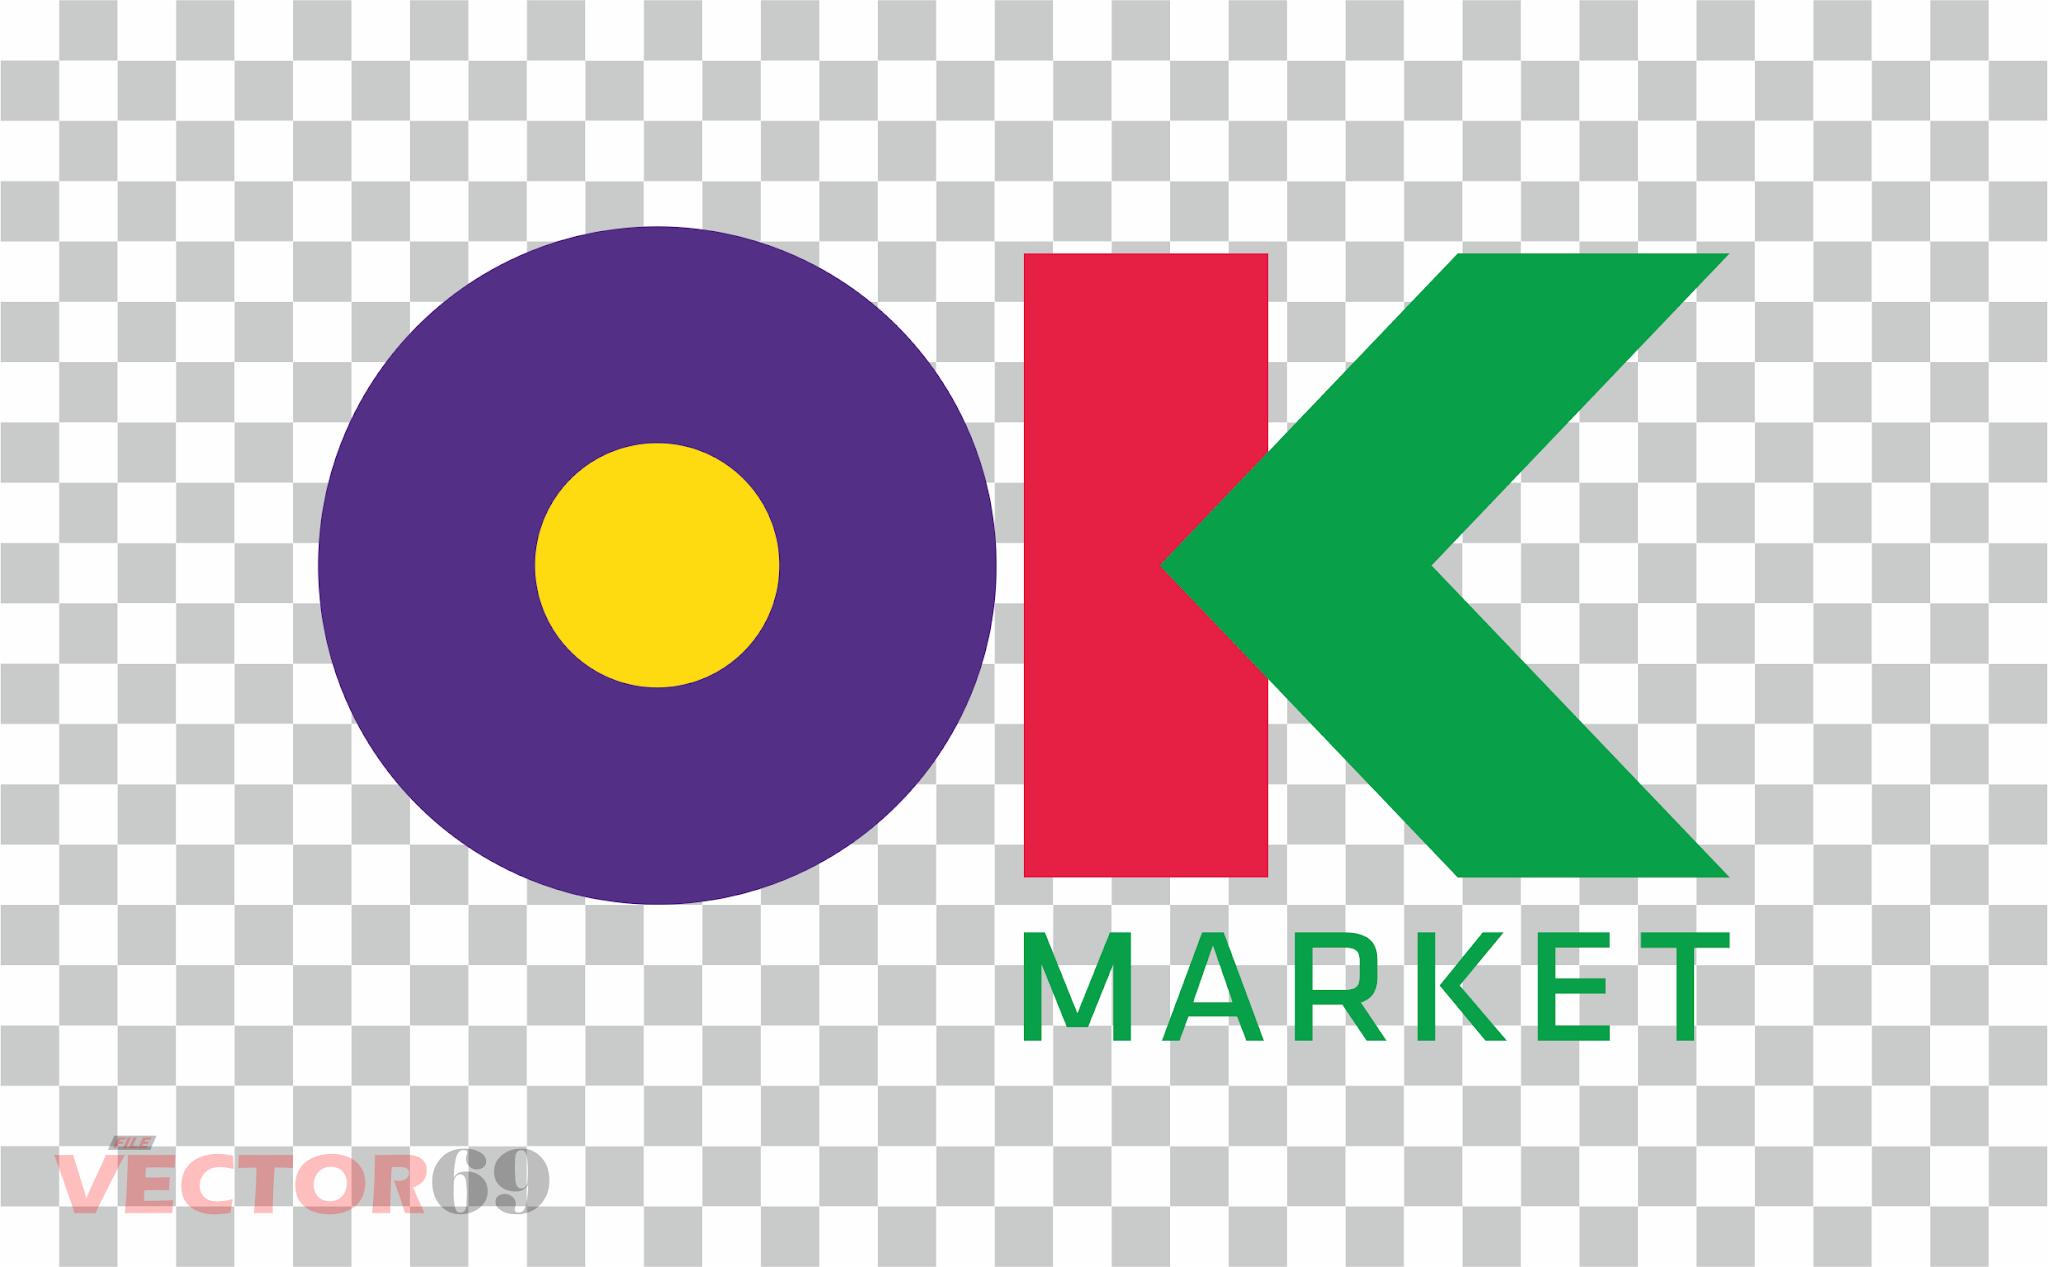 OK Market Logo - Download Vector File PNG (Portable Network Graphics)